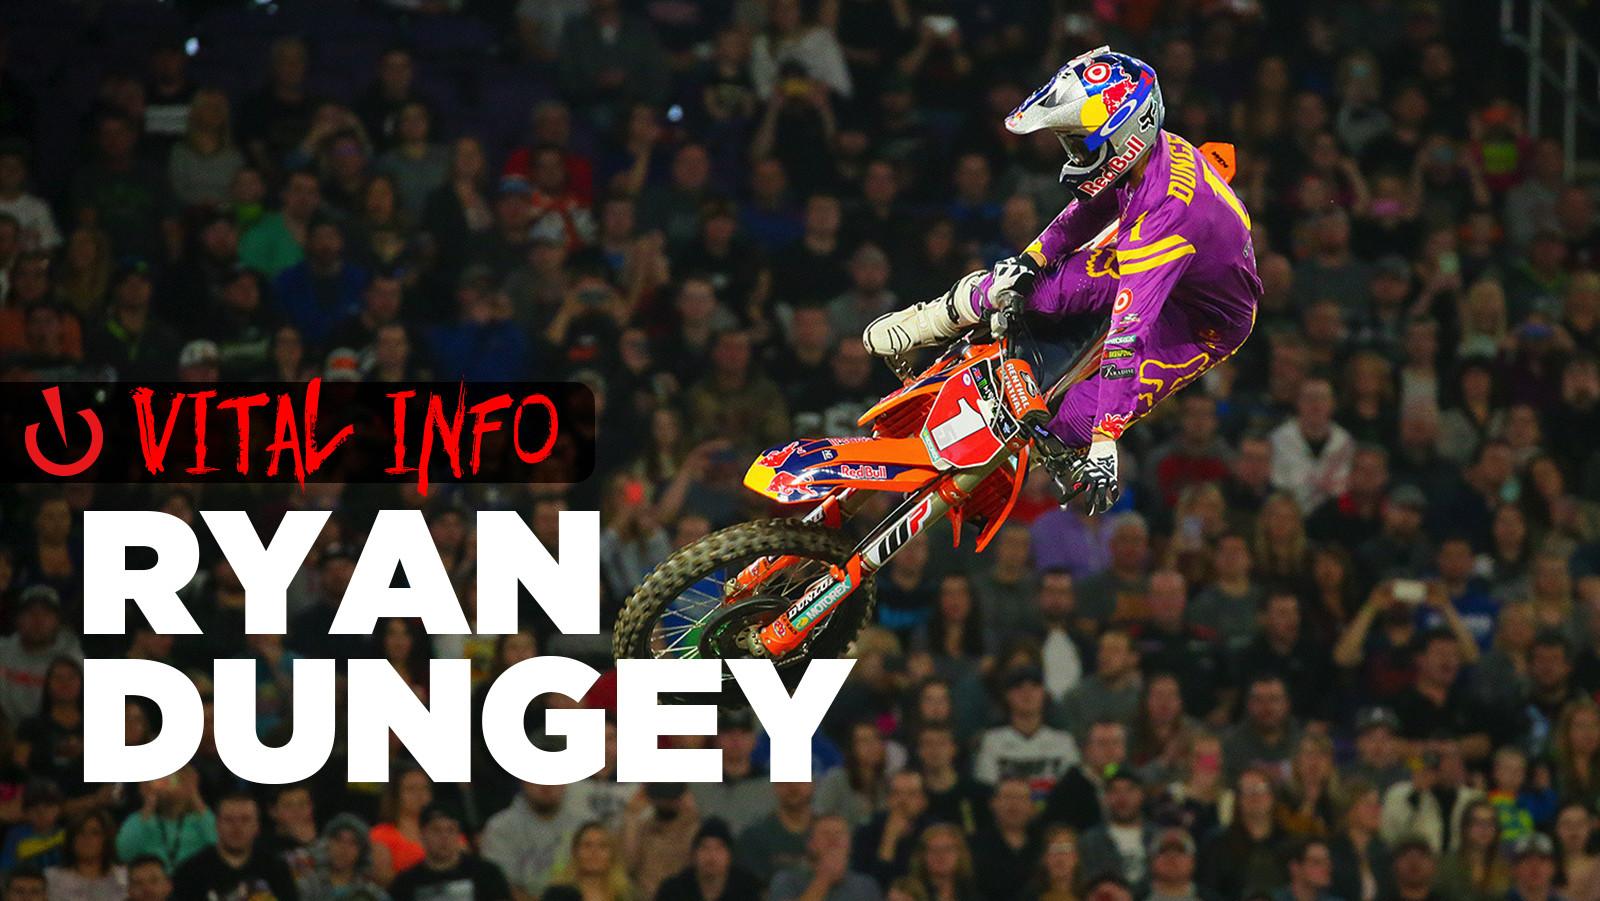 Vital Info: Ryan Dungey